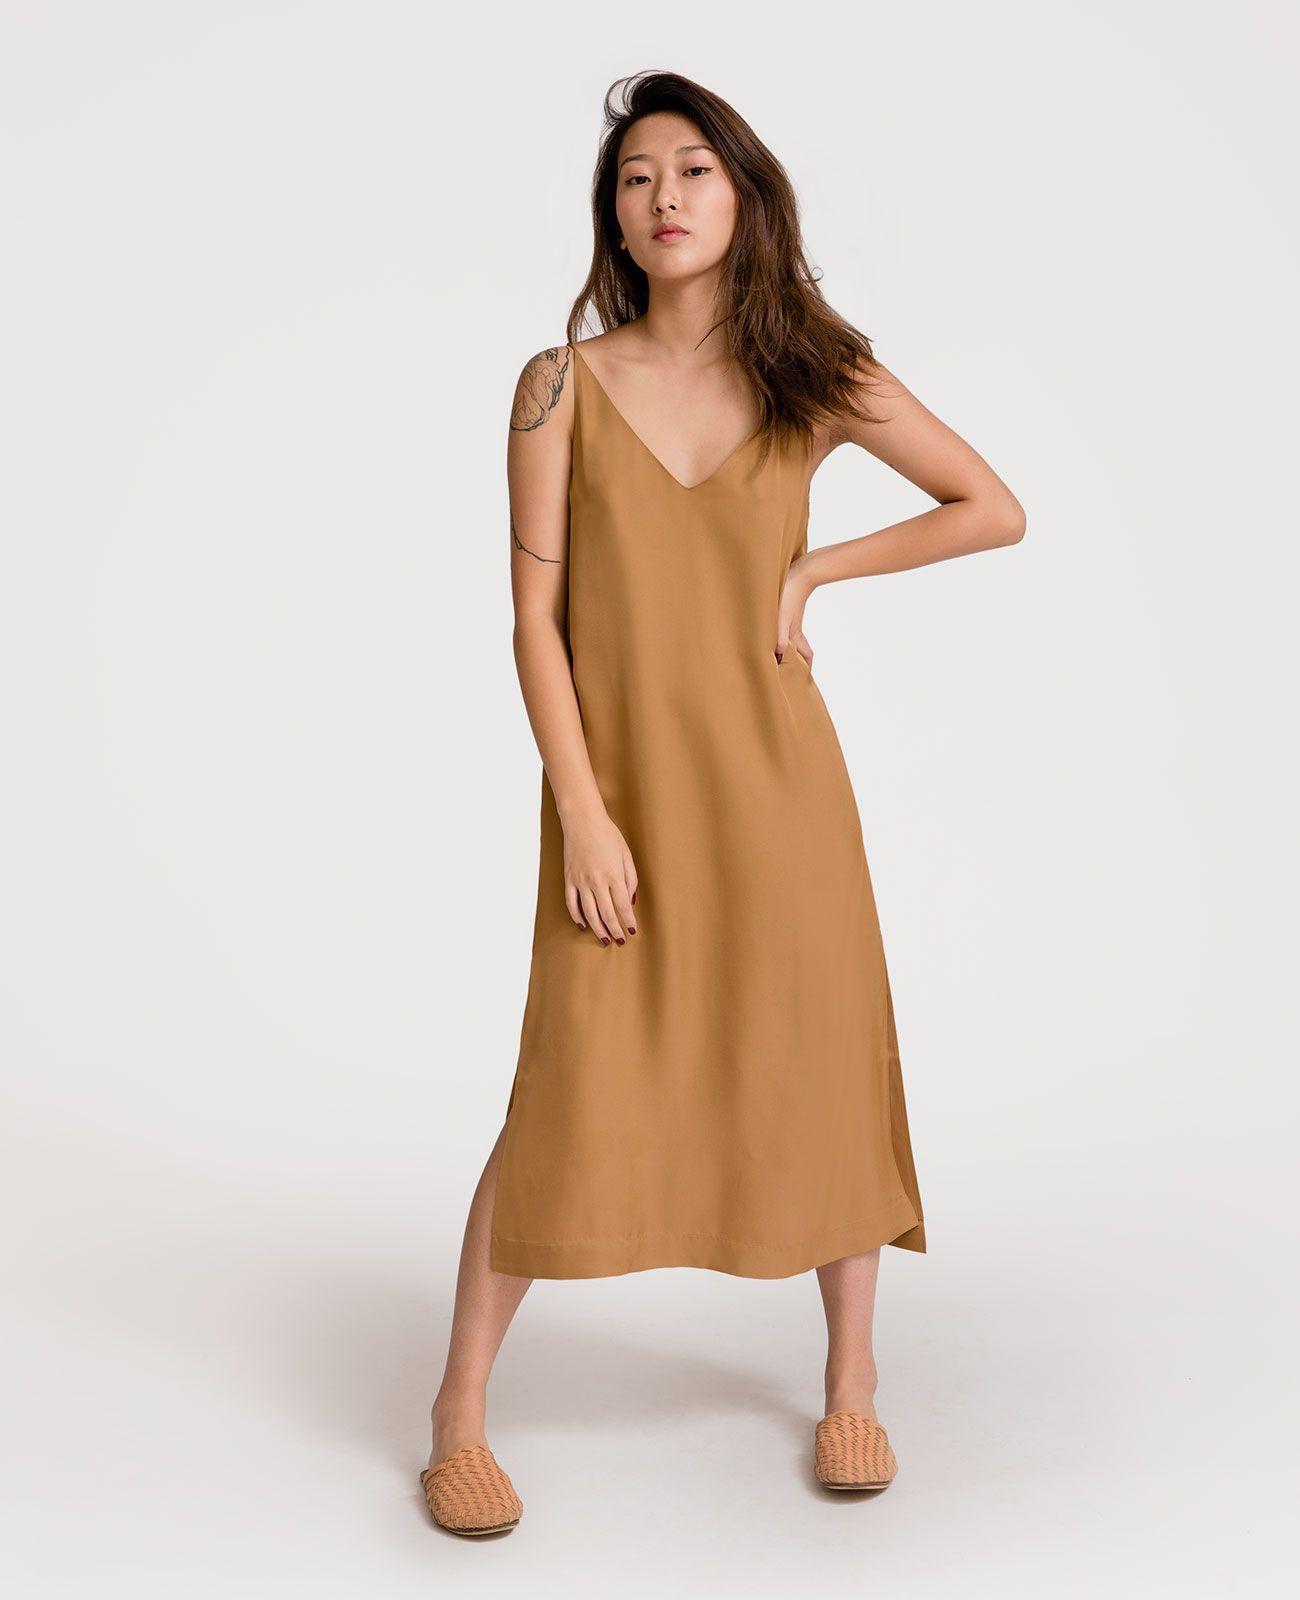 8c15b137344d Silk V-Neck Slip Dress in 2019   stylistic goals   Dresses, Dress ...